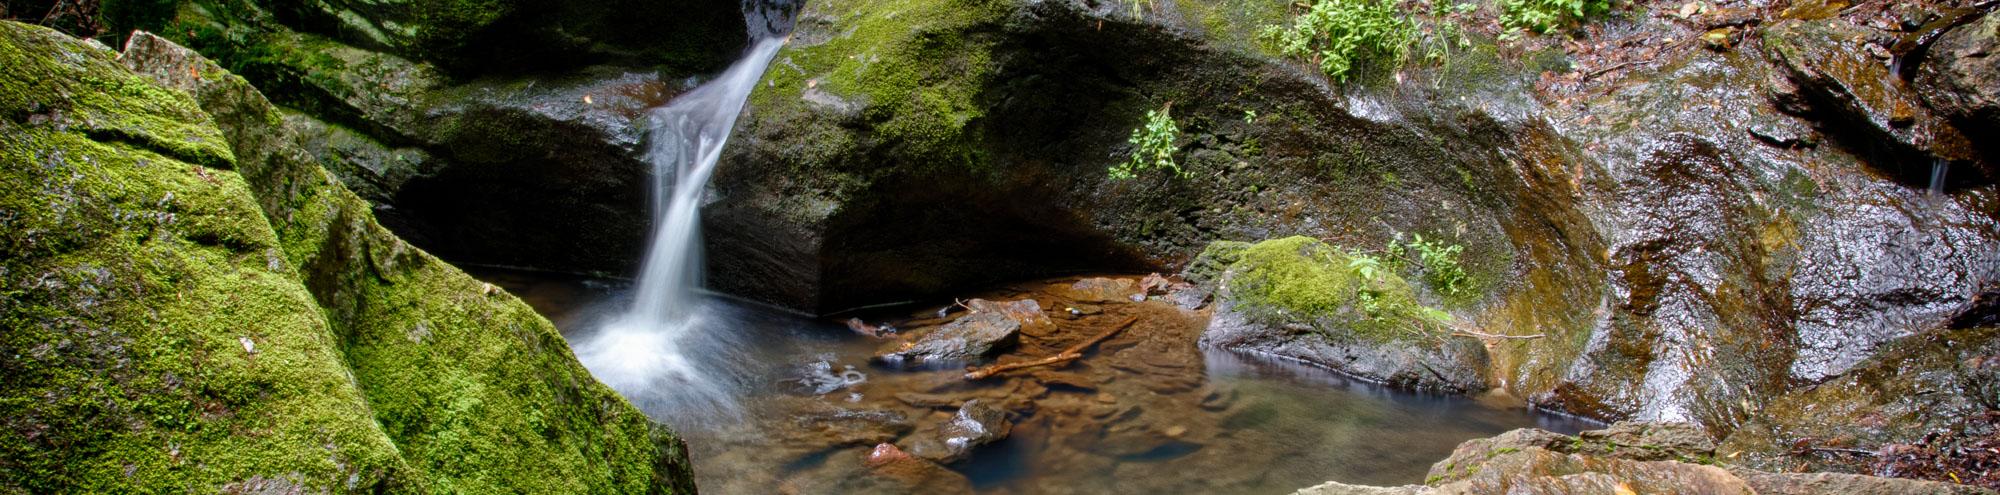 waterfall into calm pool